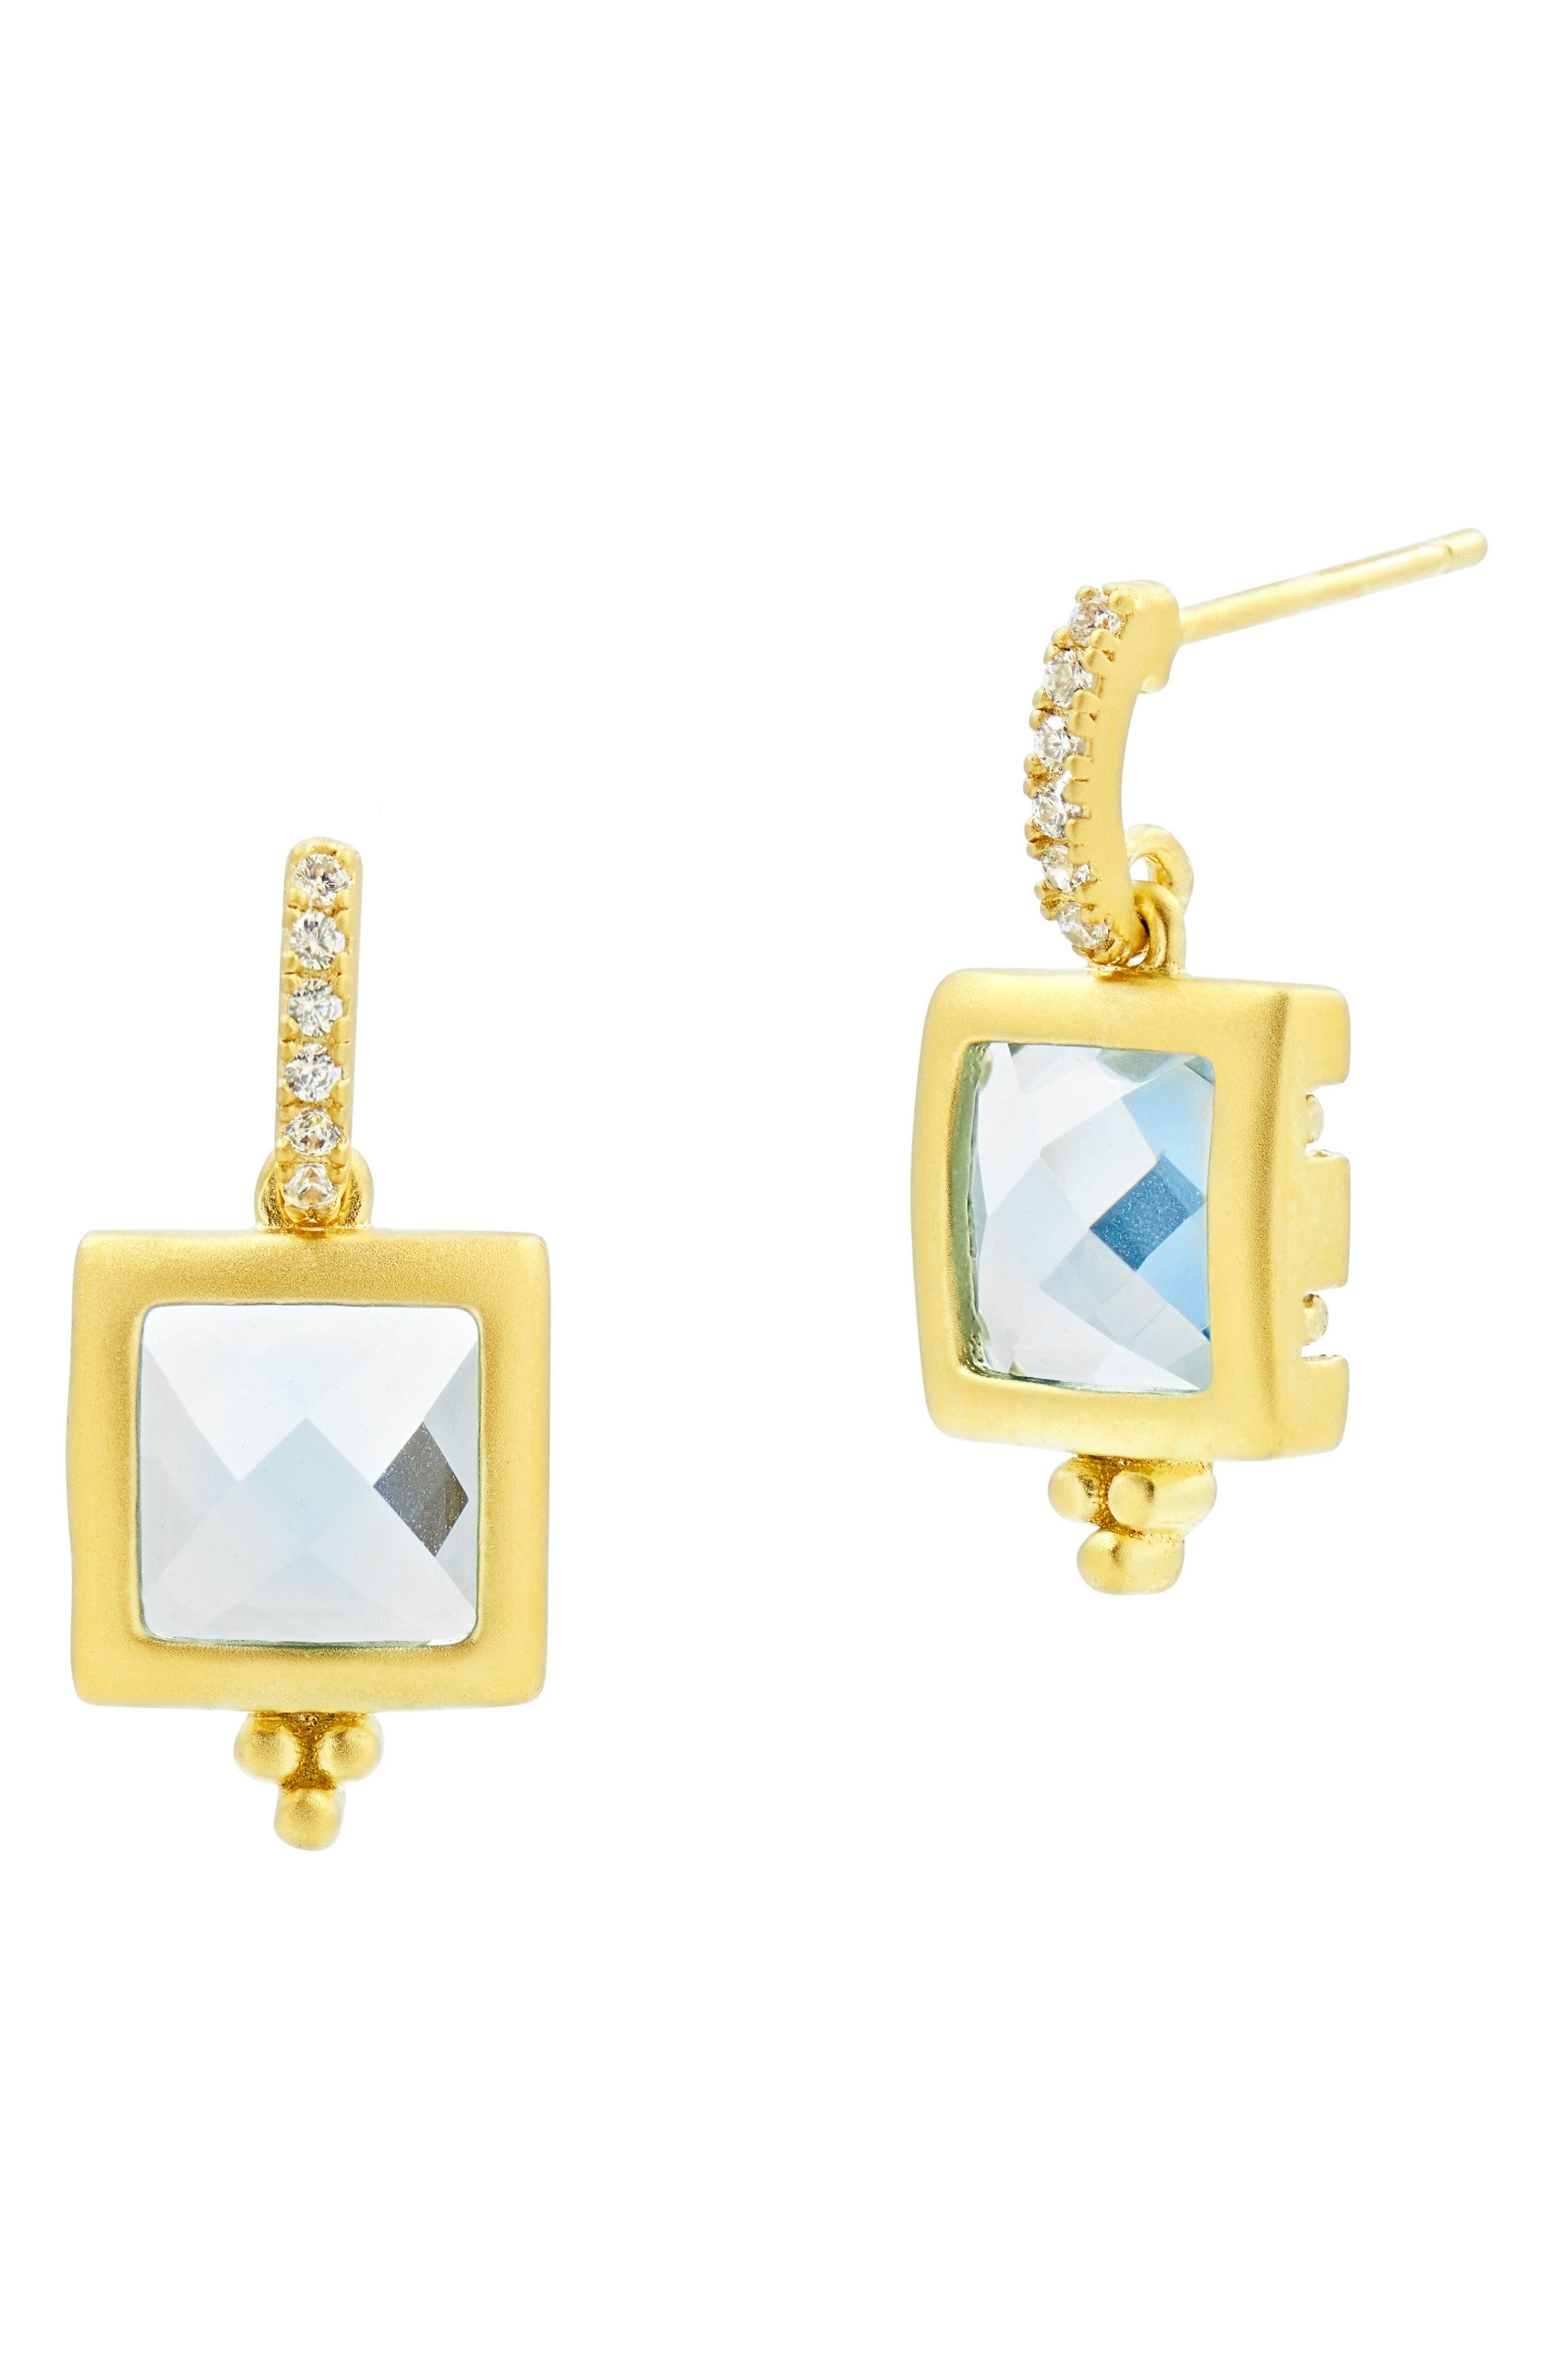 Ocean Azure Cubic Zirconia Stud Earrings,                             Main thumbnail 1, color,                             Gold/ Aqua